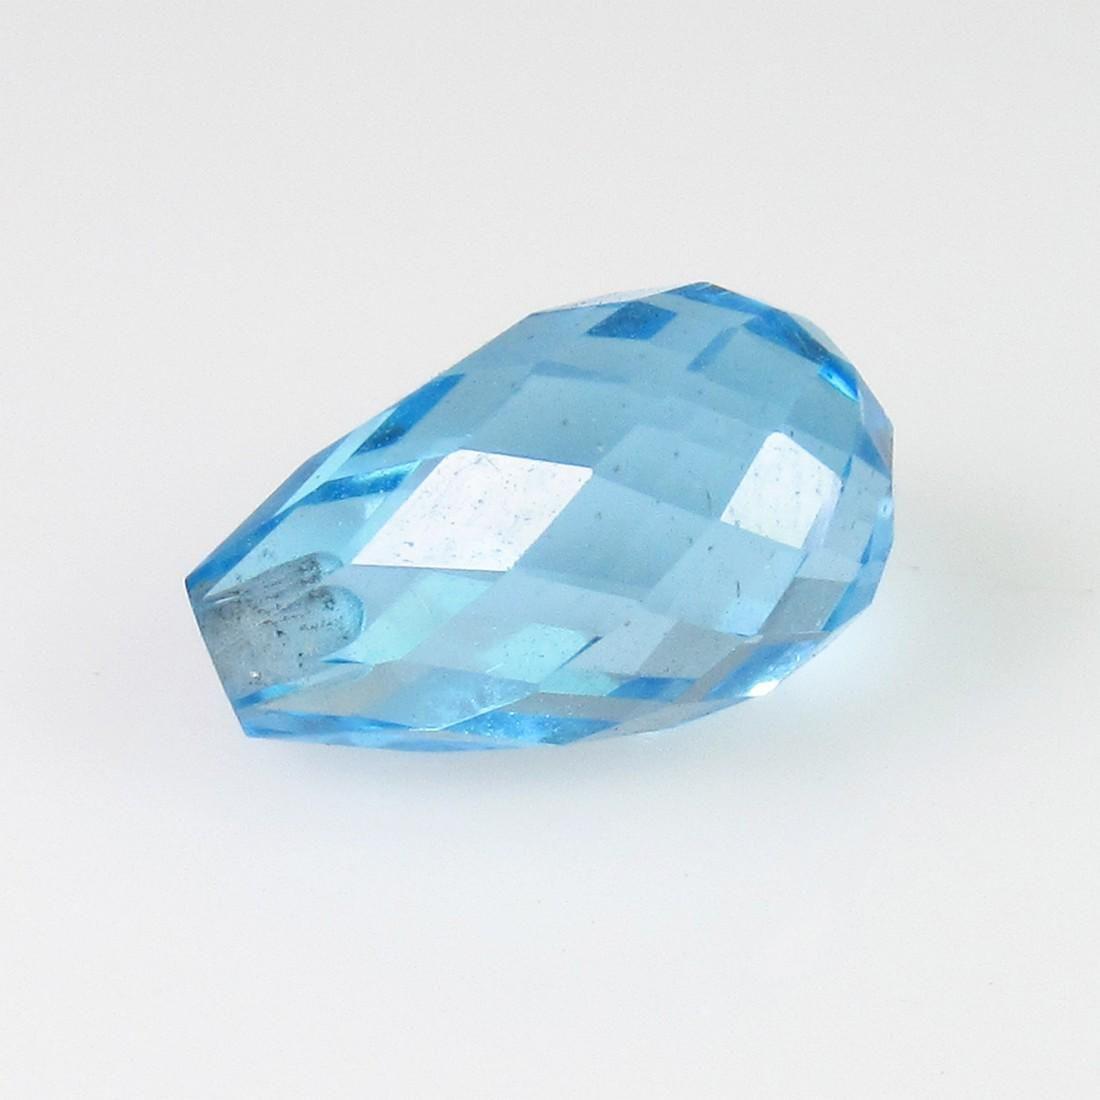 3.39 Ct Genuine Swiss Blue Topaz Drilled Pear Drop